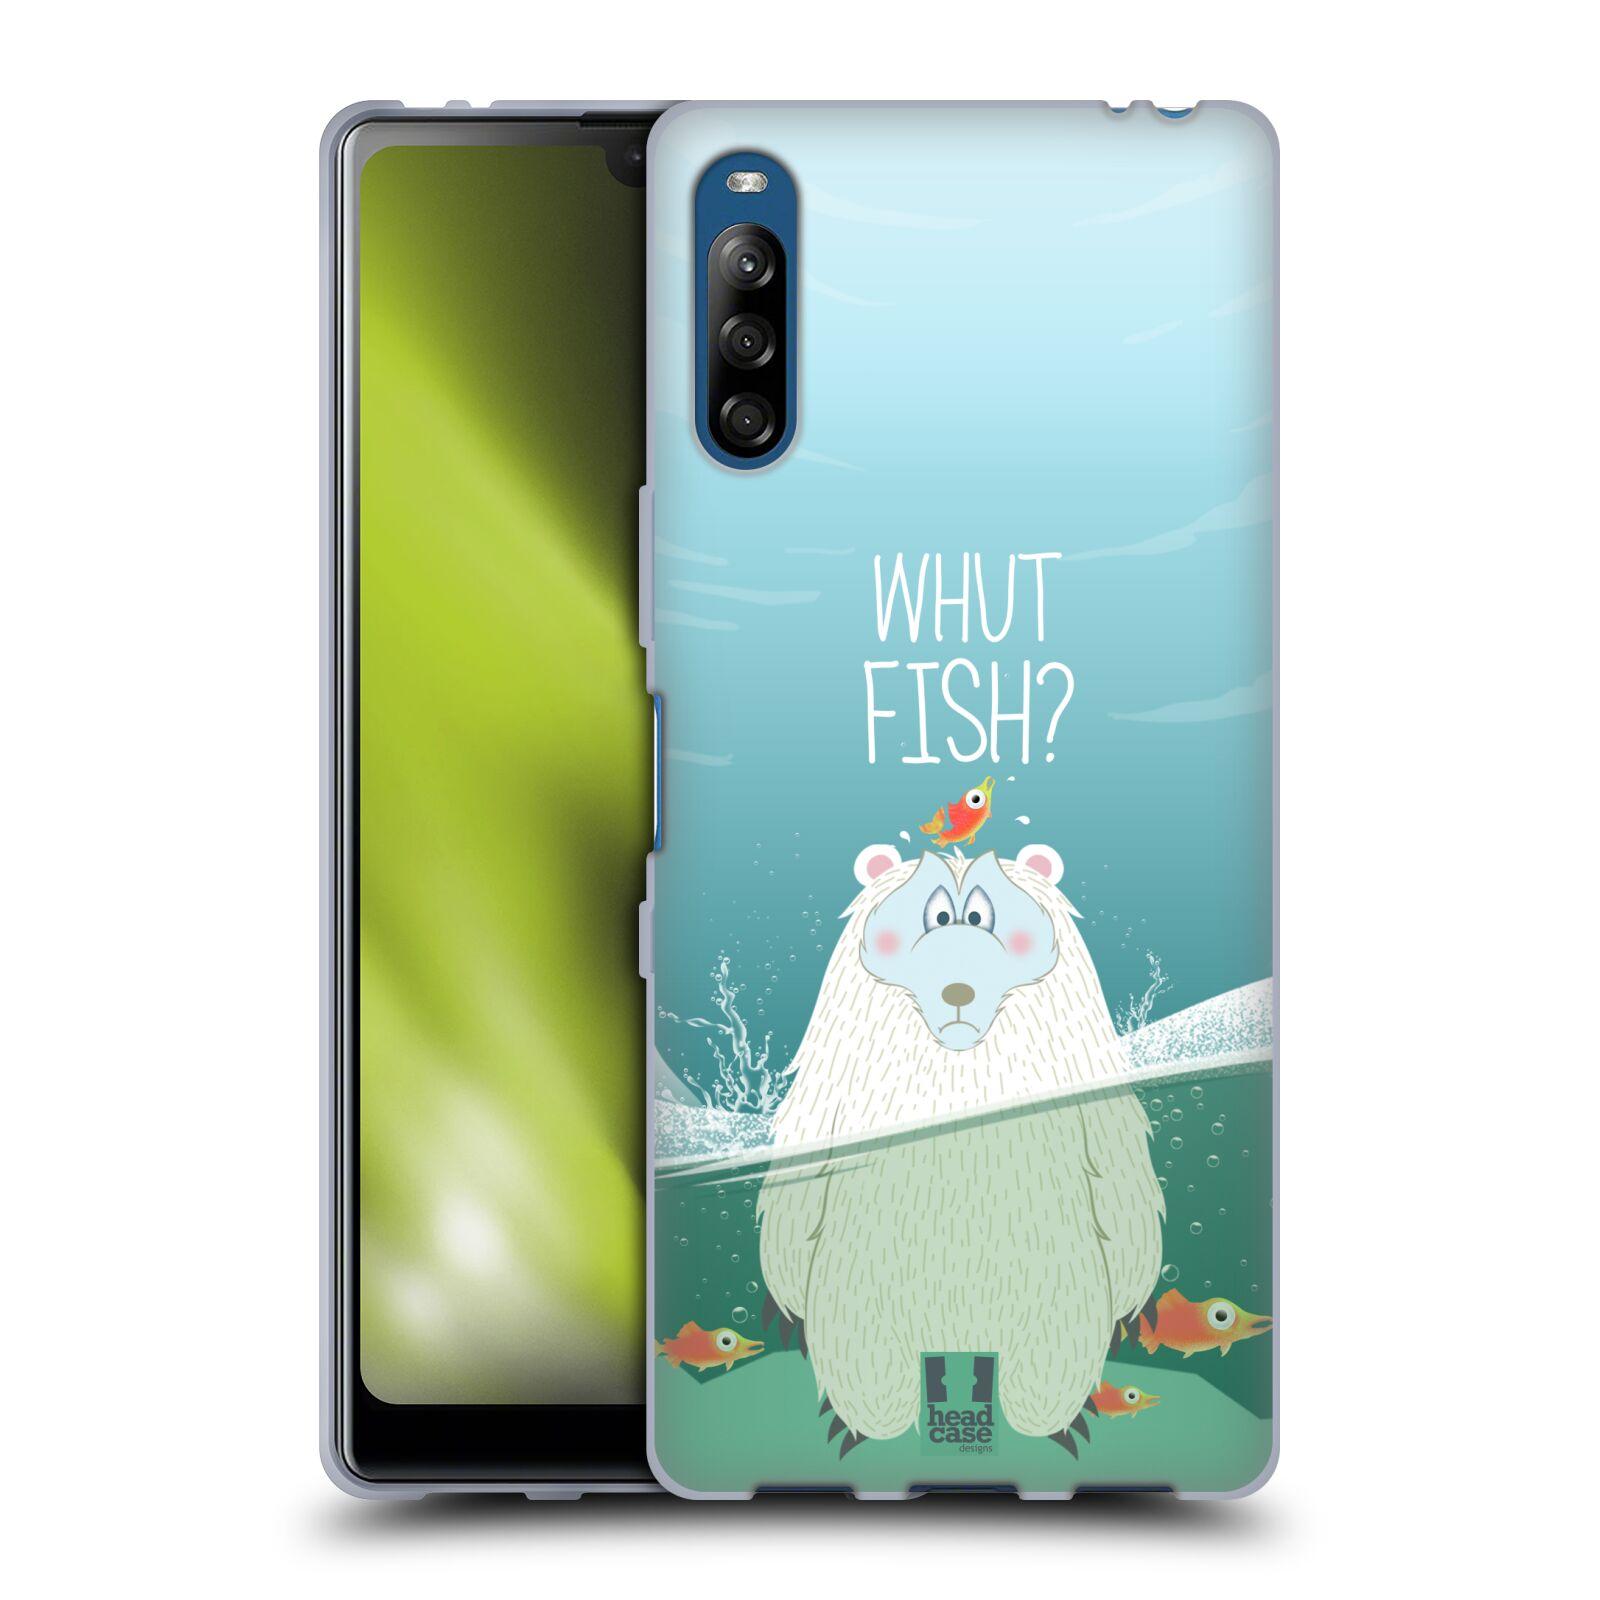 Silikonové pouzdro na mobil Sony Xperia L4 - Head Case - Medvěd Whut Fish?